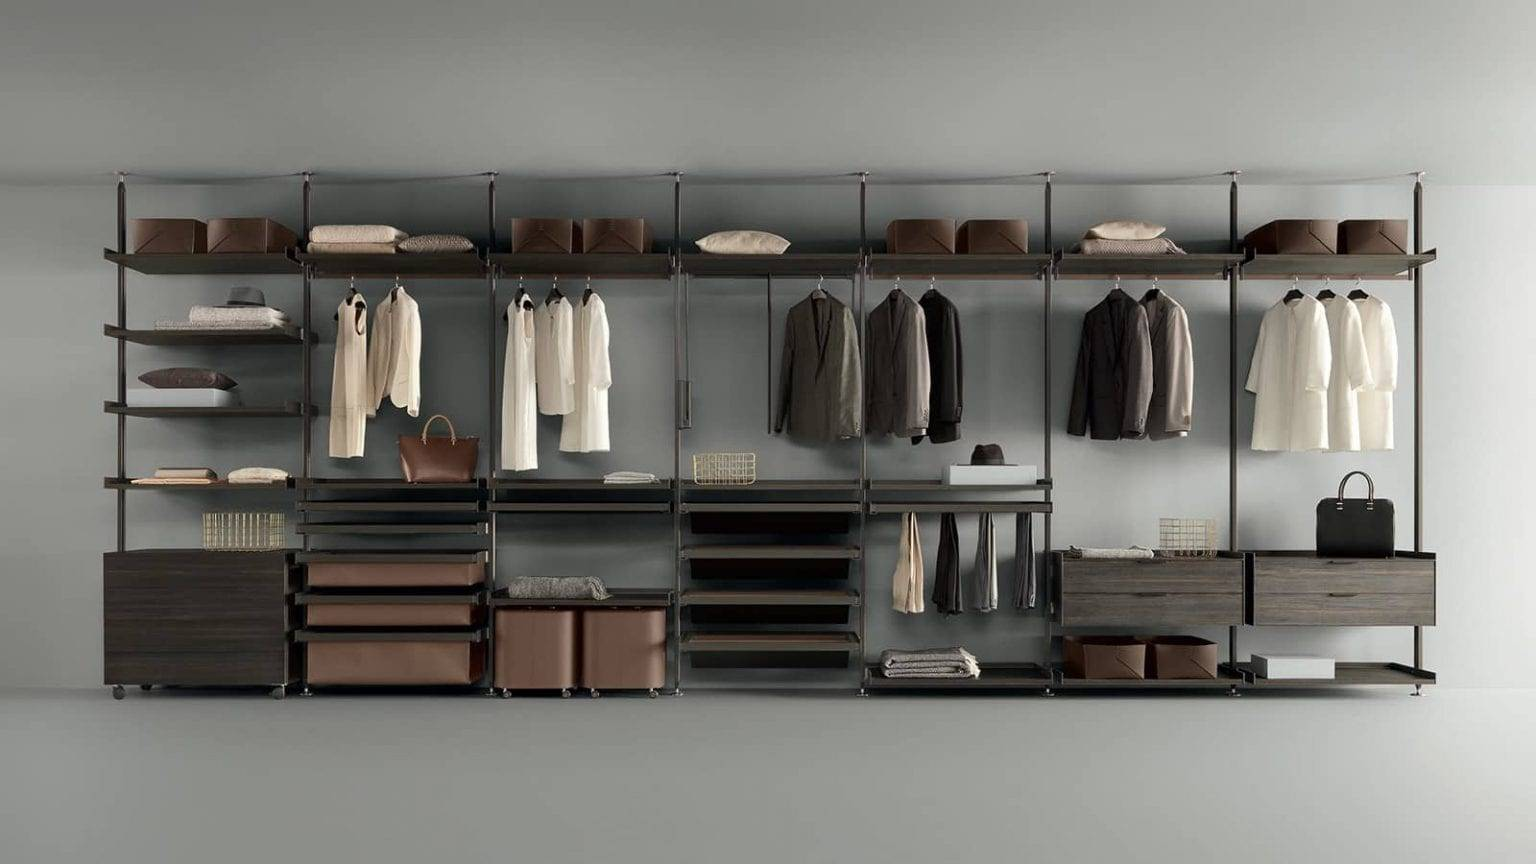 exclusieve italiaanse rimadesio inloopkast op maat in aluminium en grijsachtig hout